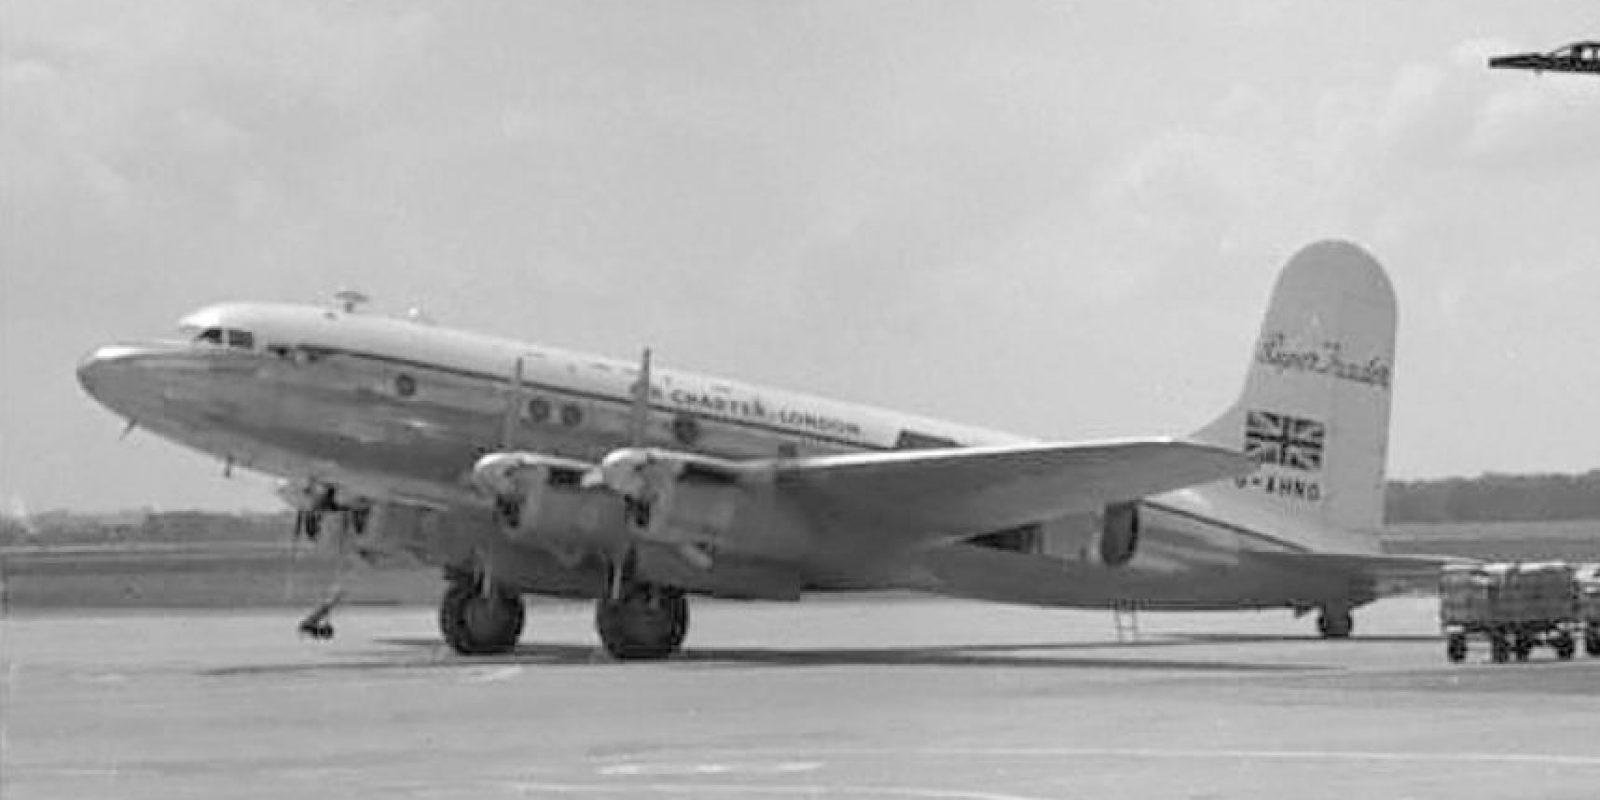 La aeronave Star Tiger desapareció completamente el 30 de enero de 1948. Foto:Wikipedia.org